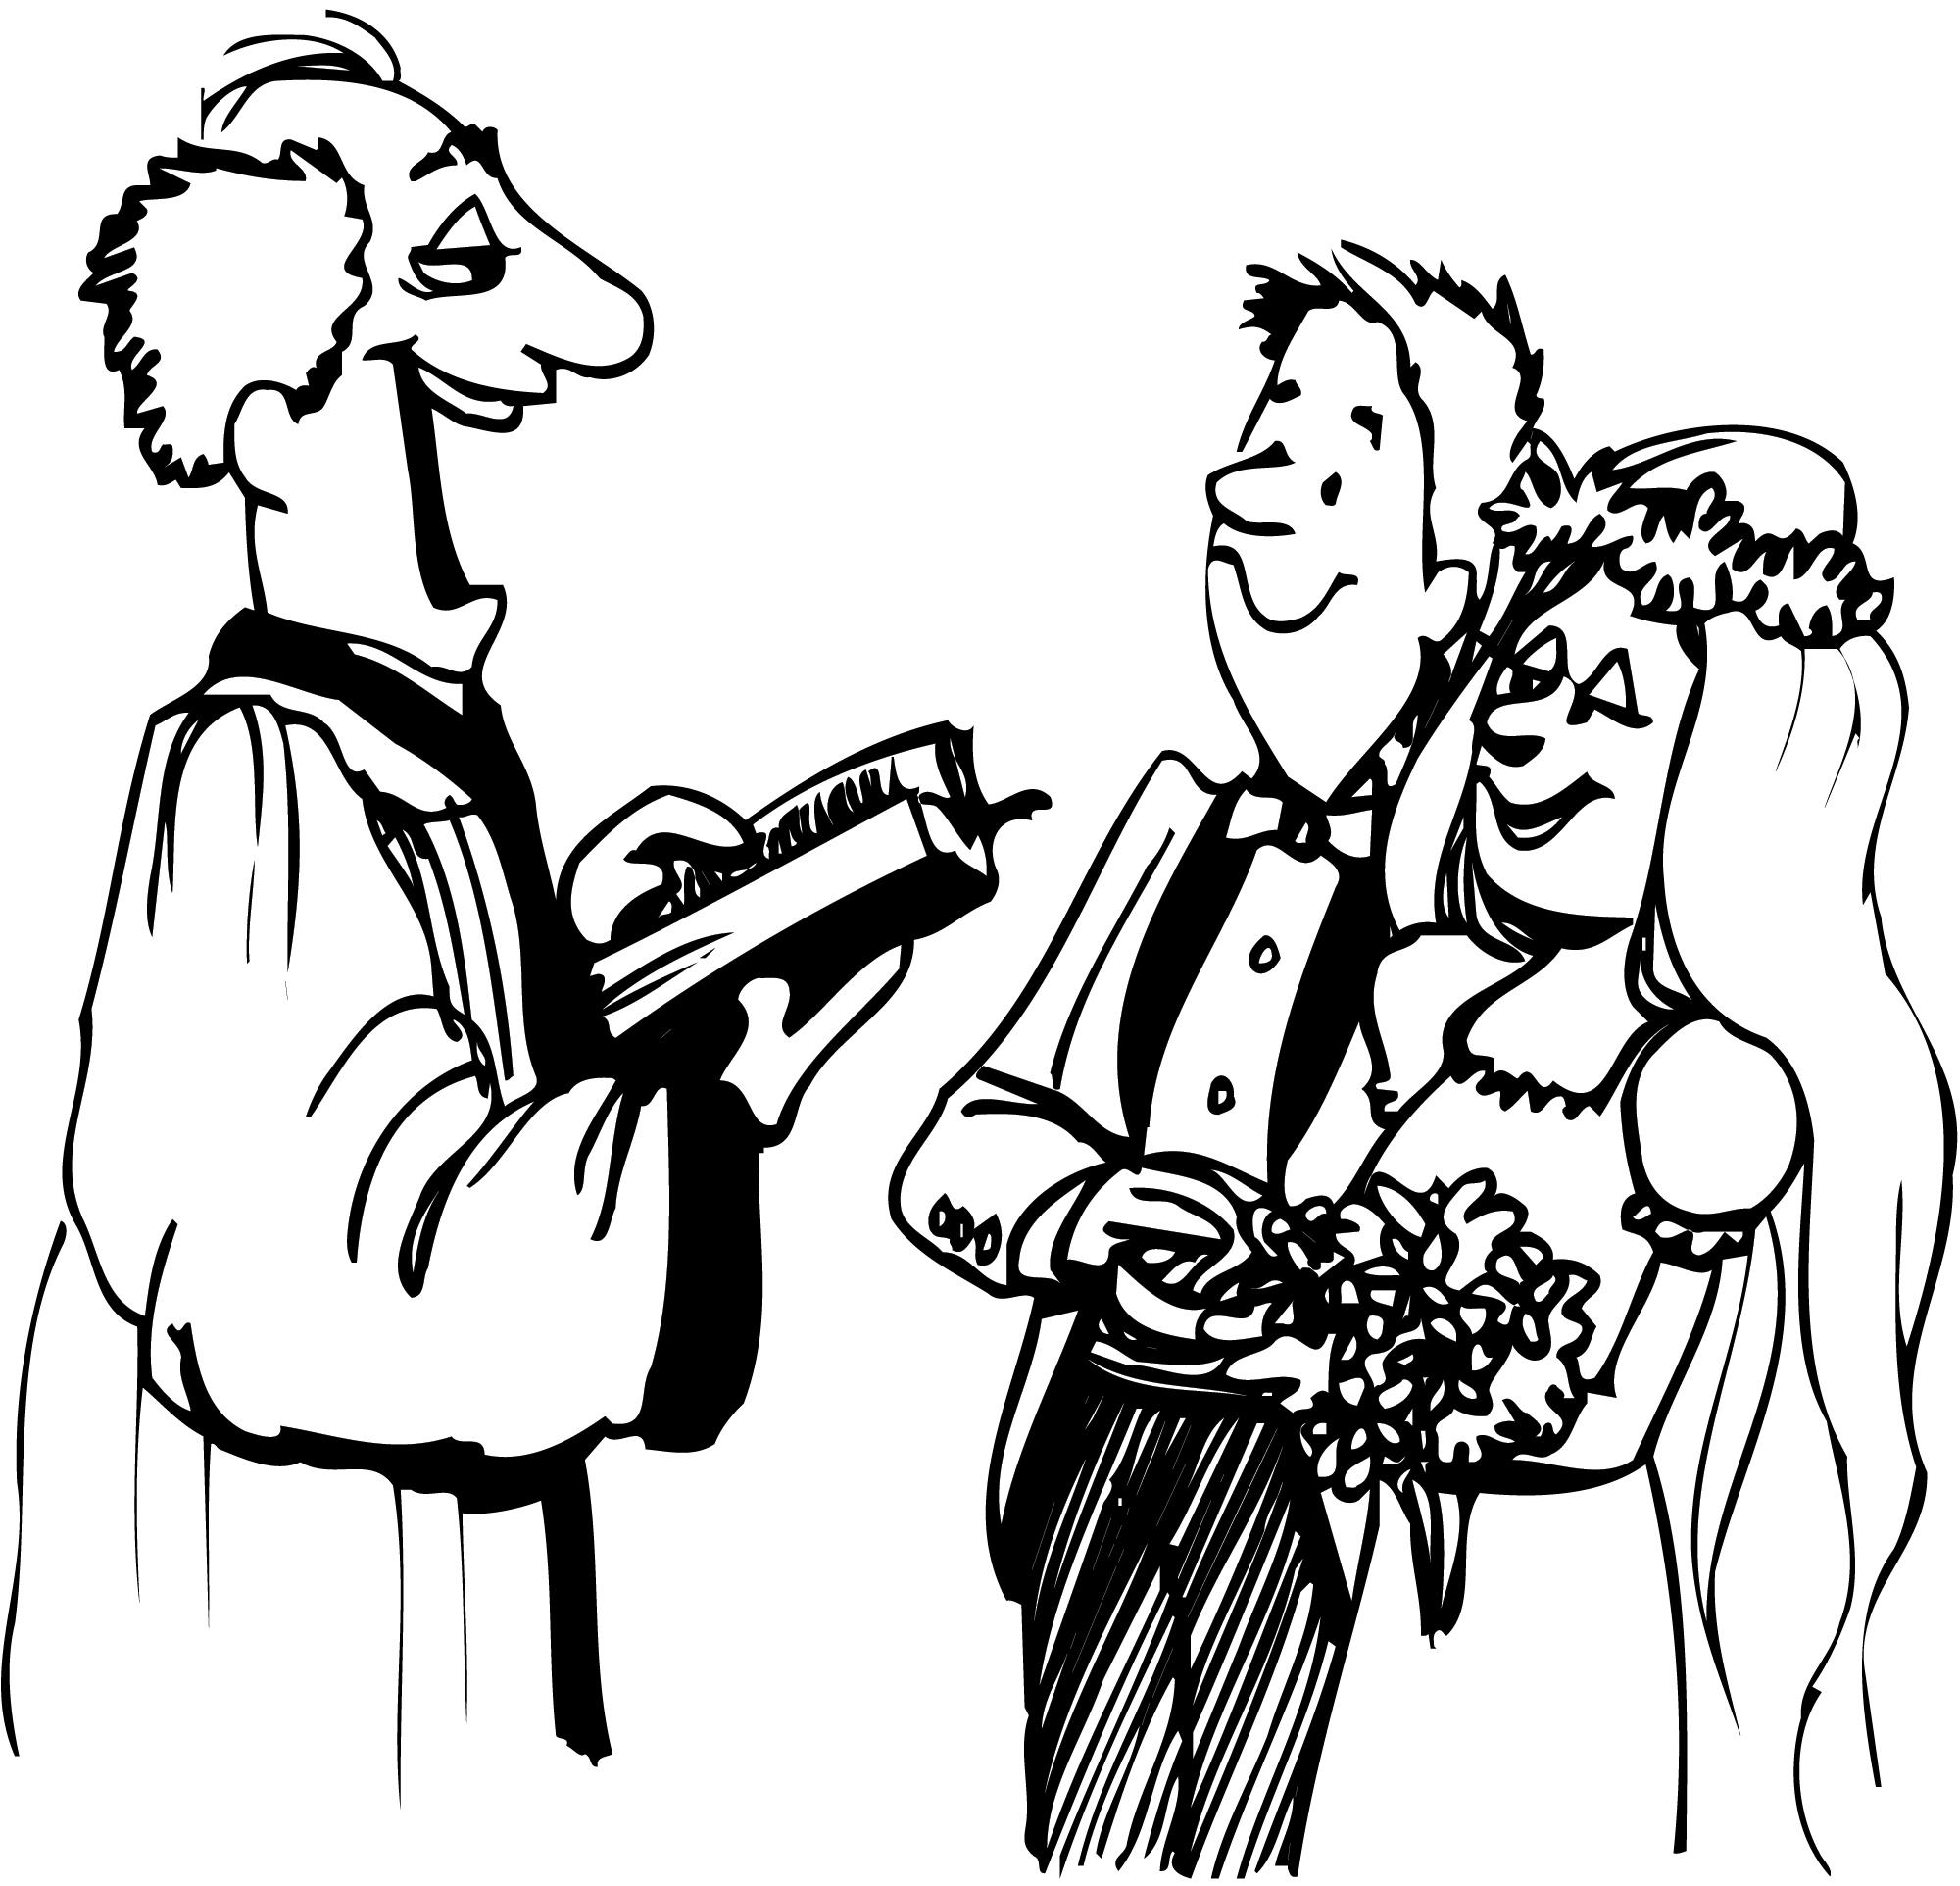 Weddingclipart-Weddingclipart-9